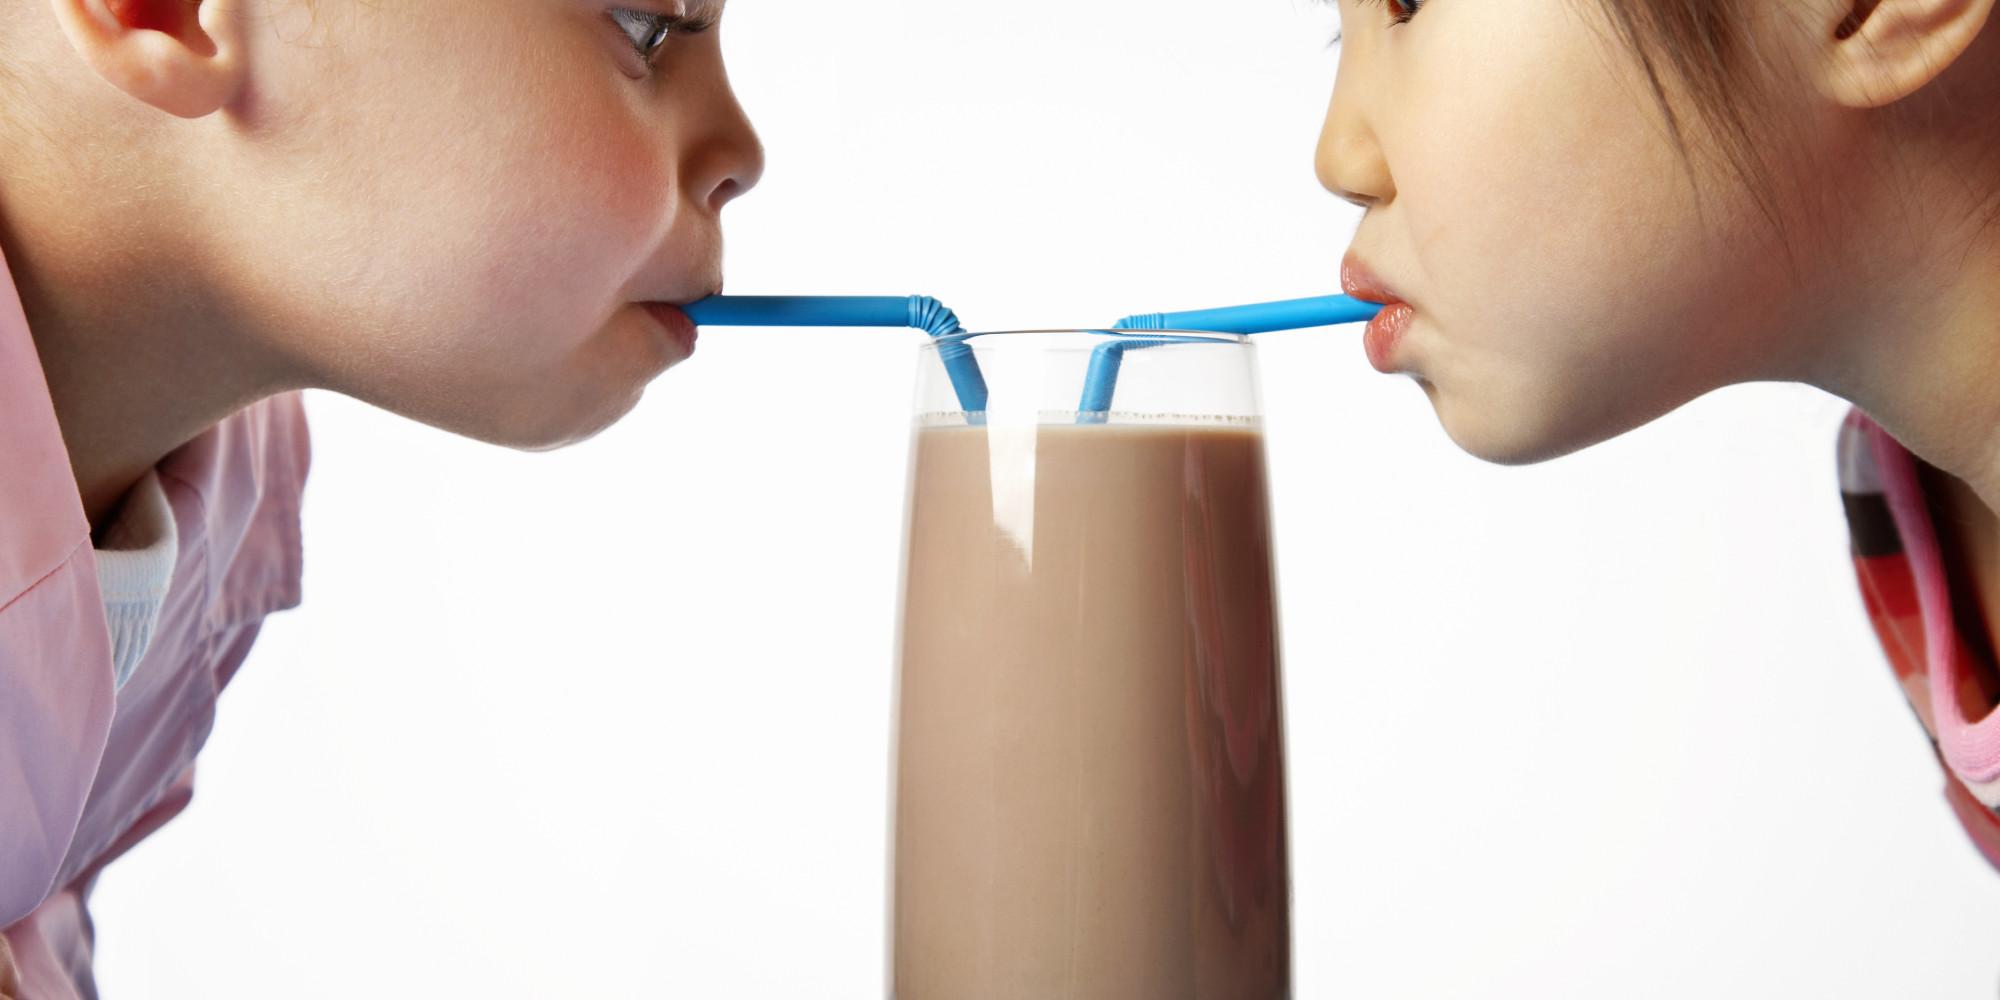 Hot Chocolate Huffington Post